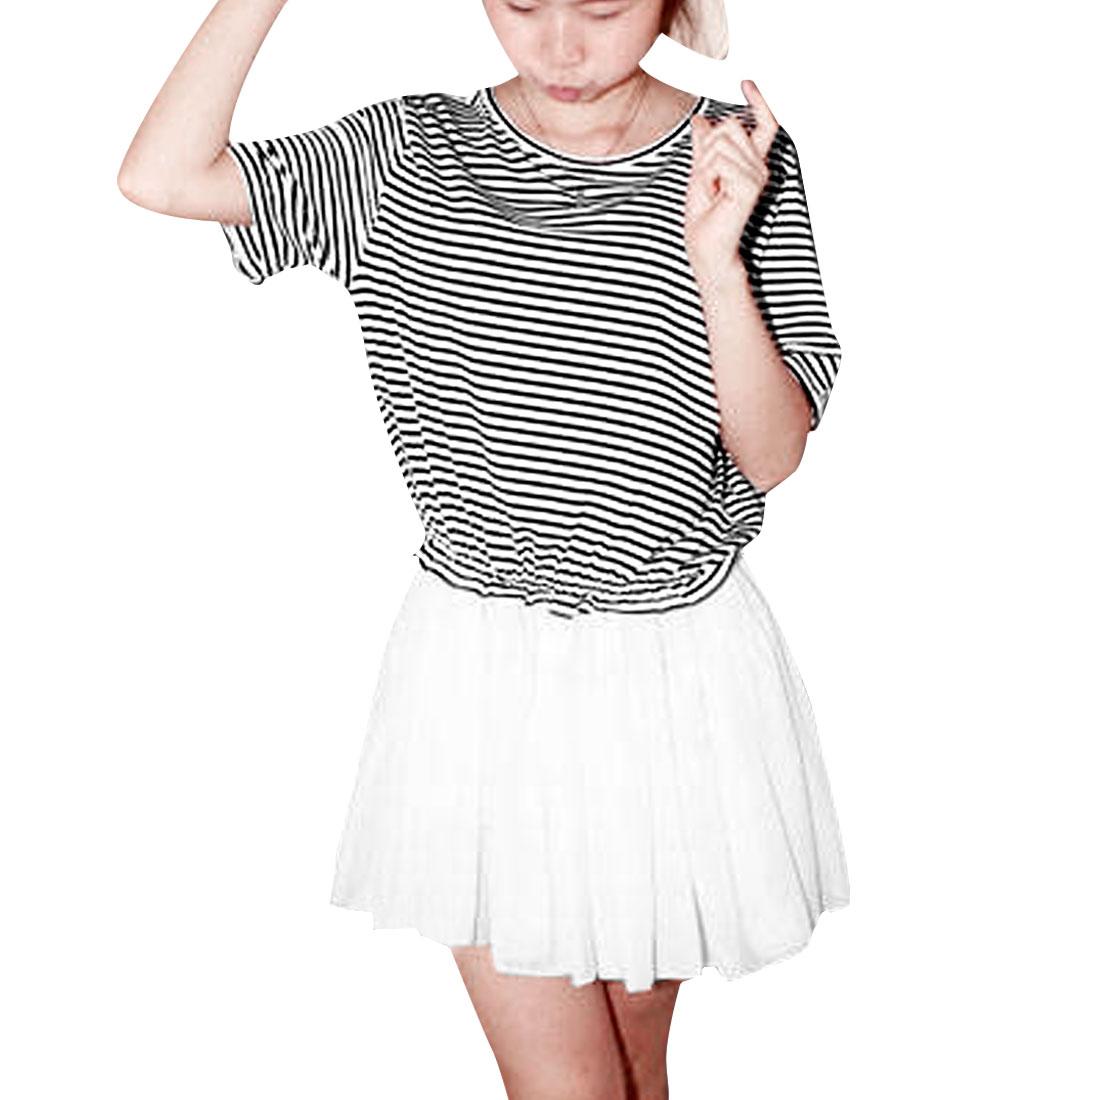 Ladies Round Neck Elastic Waist Spliced Chiffon Dress Black White M